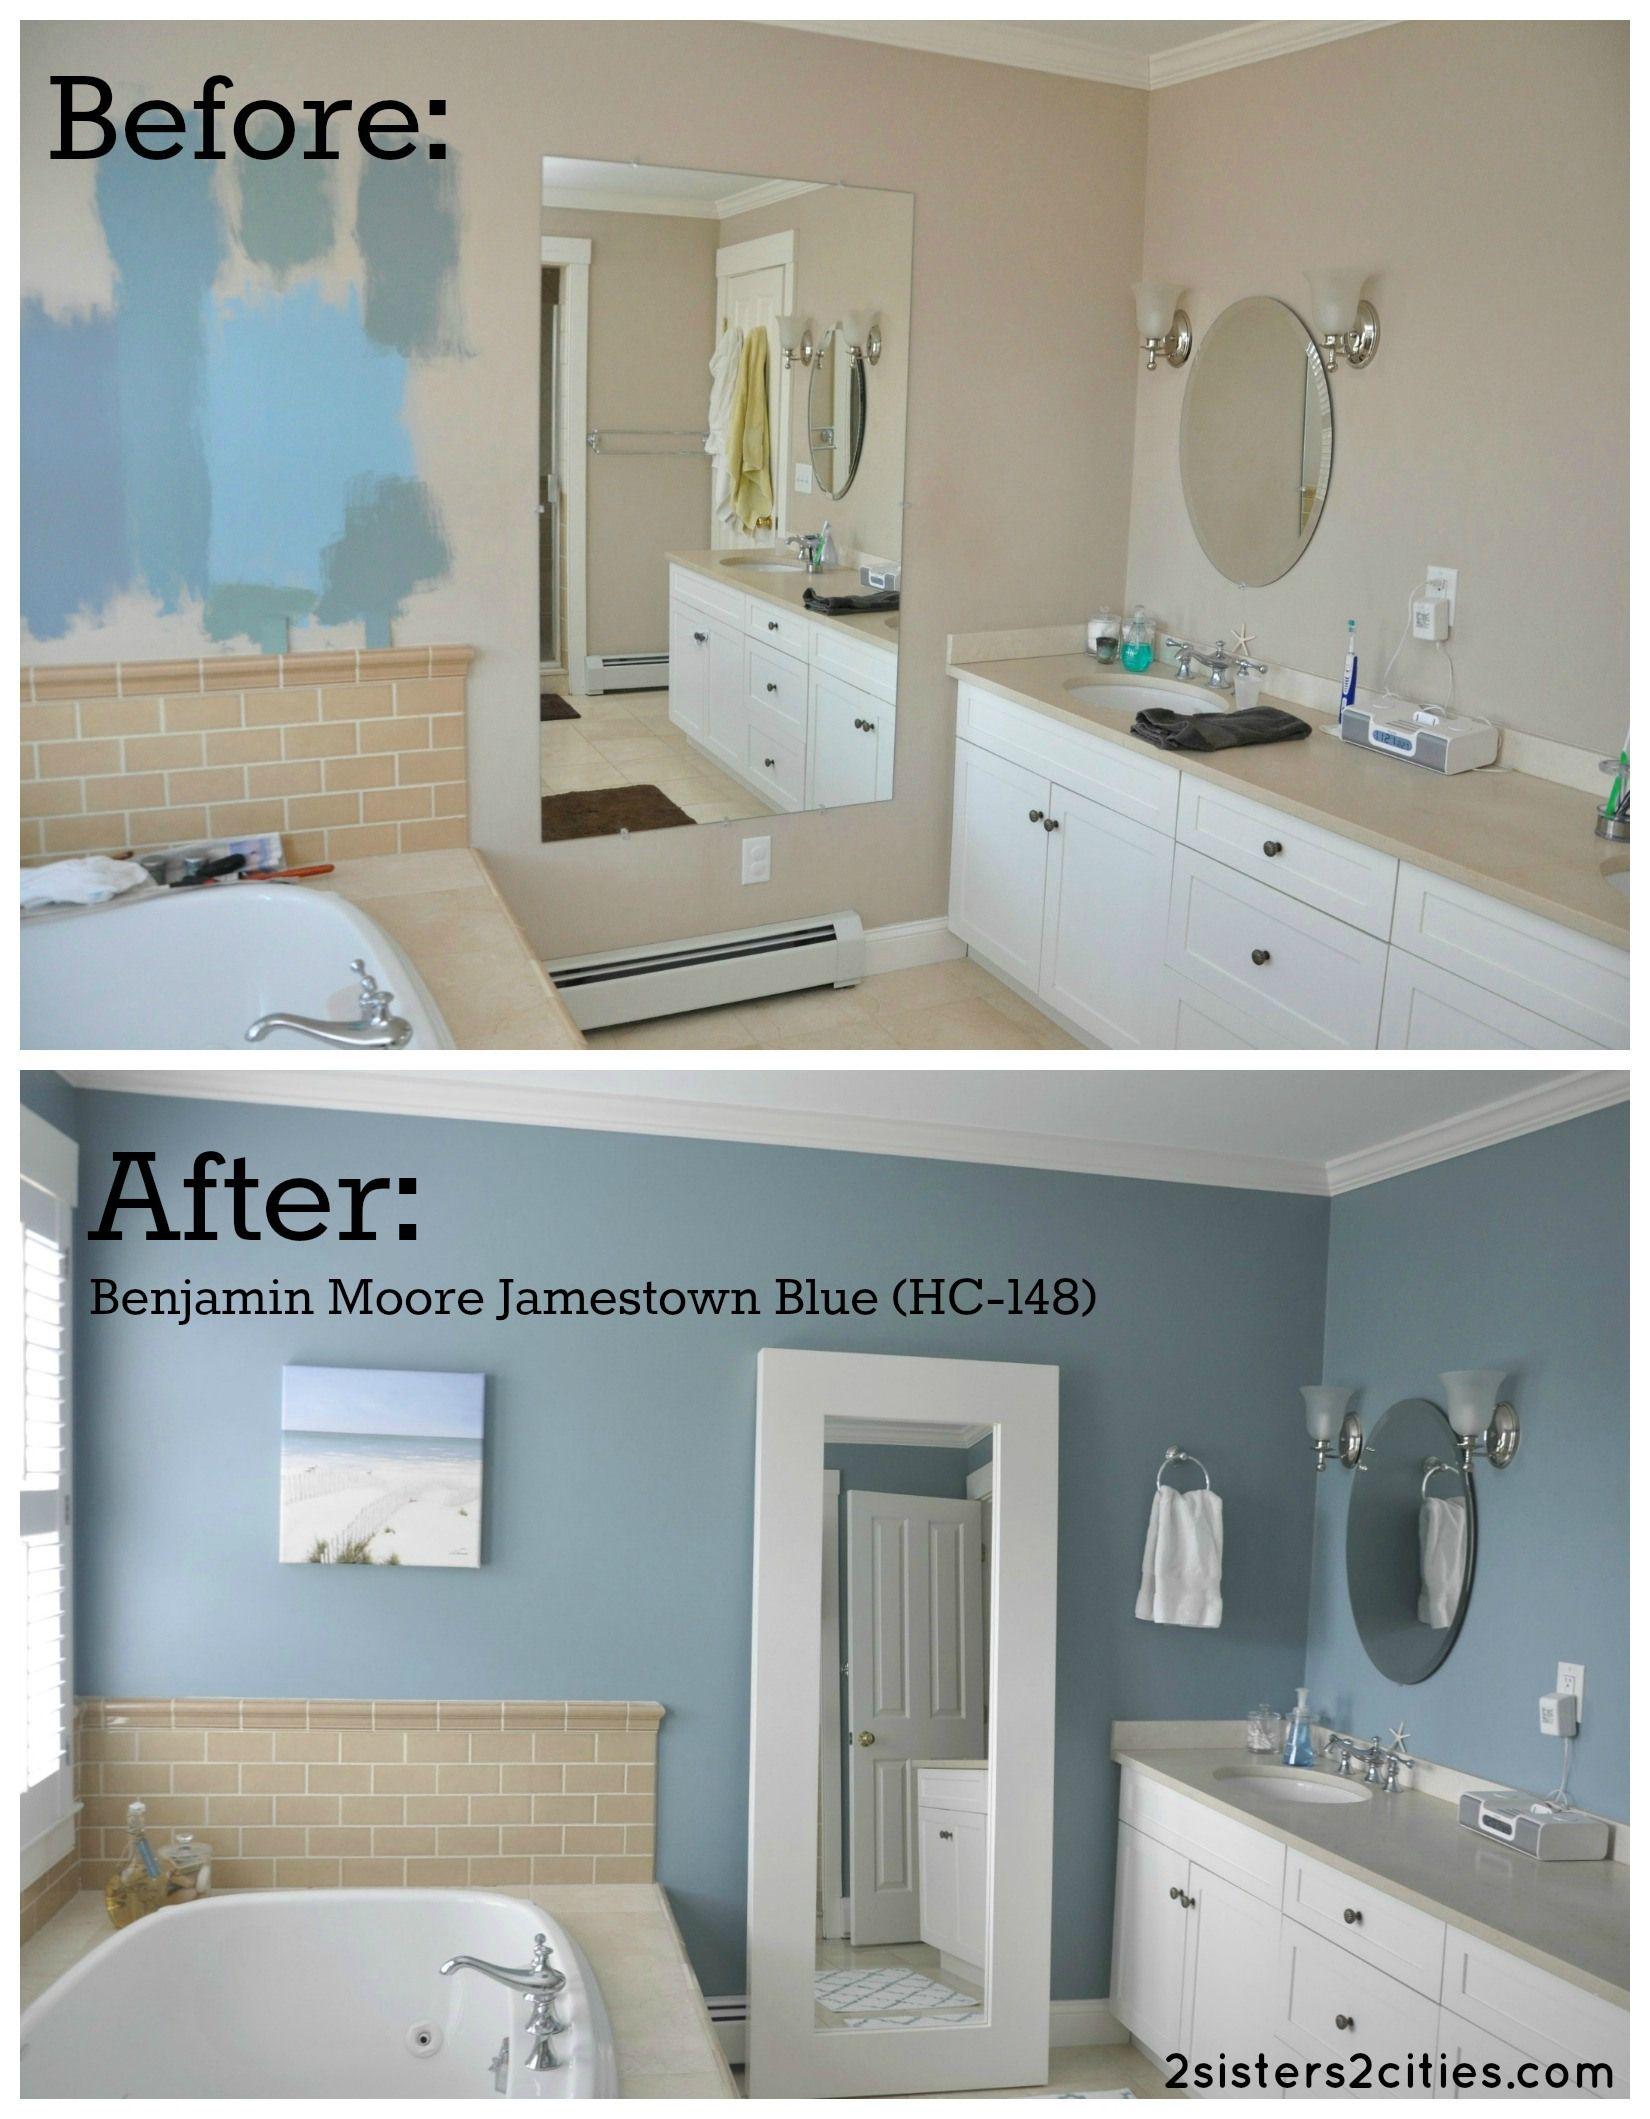 Benjamin moore palladian blue bathroom - Jamestown Blue By Benjamin Moore 2 Sisters 2 Cities Jamestown Blue By Benjamin Moore 2